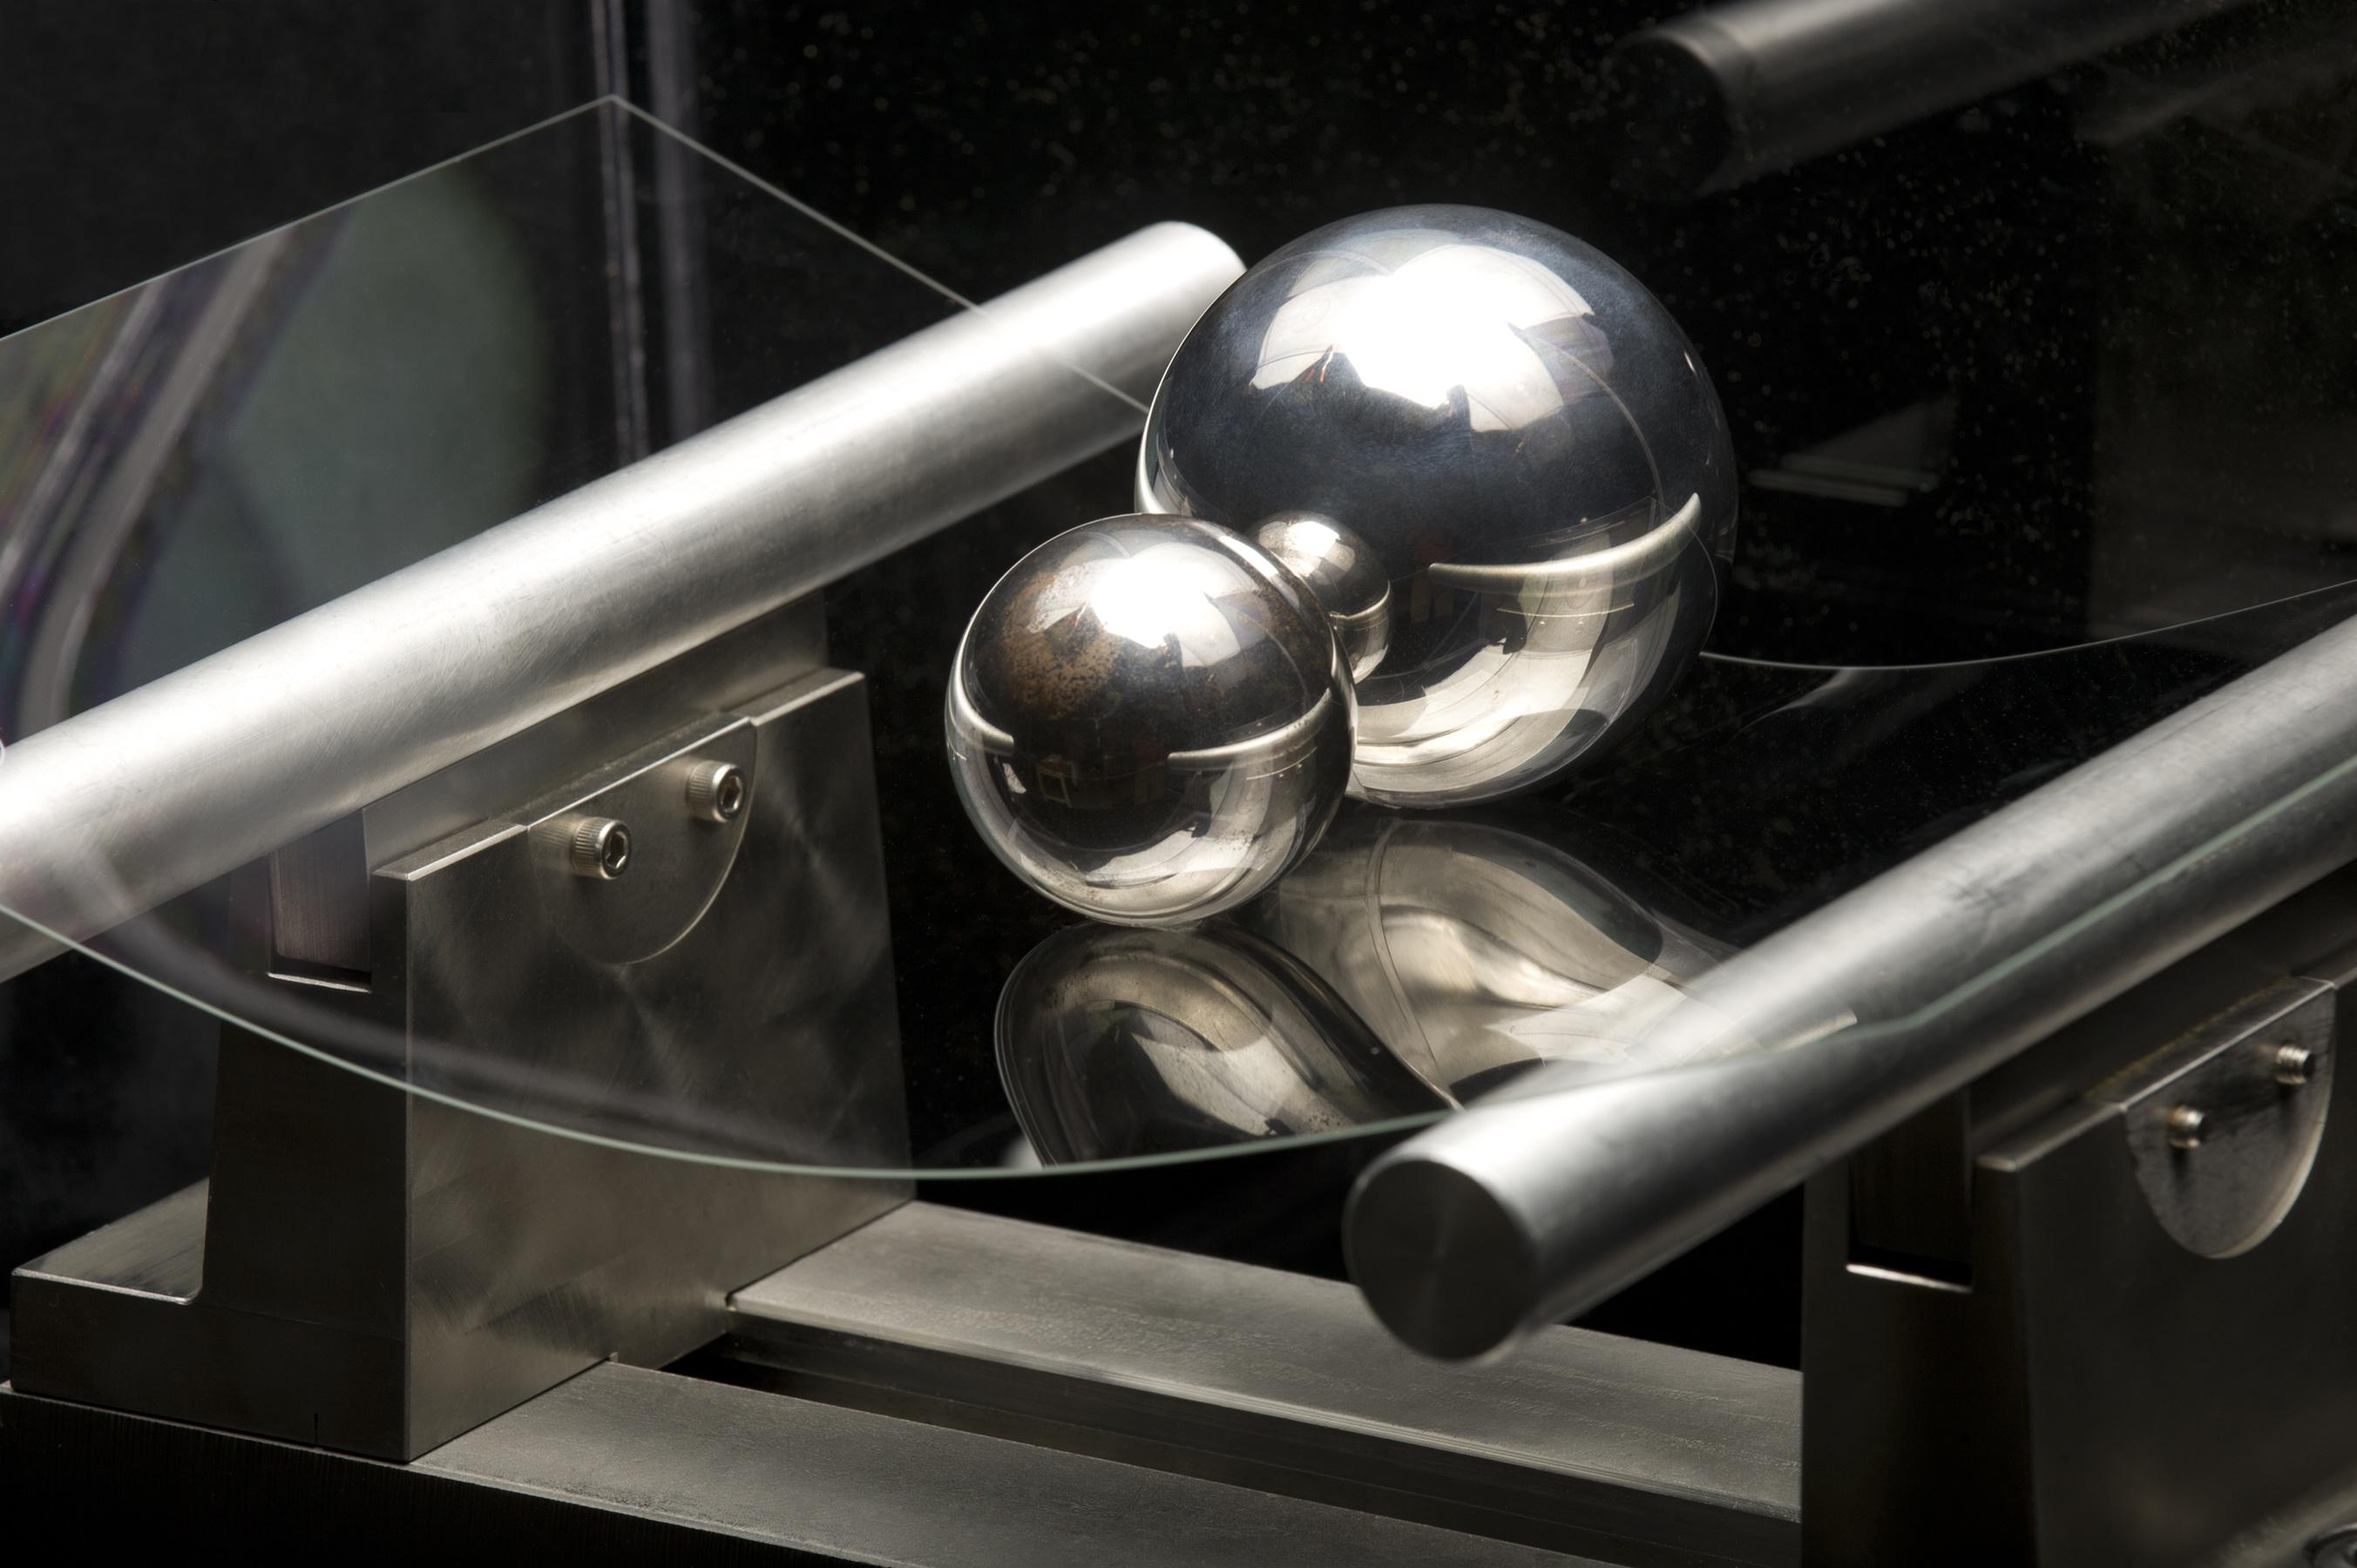 Vidro da Corning sendo testado - Gorilla Glass